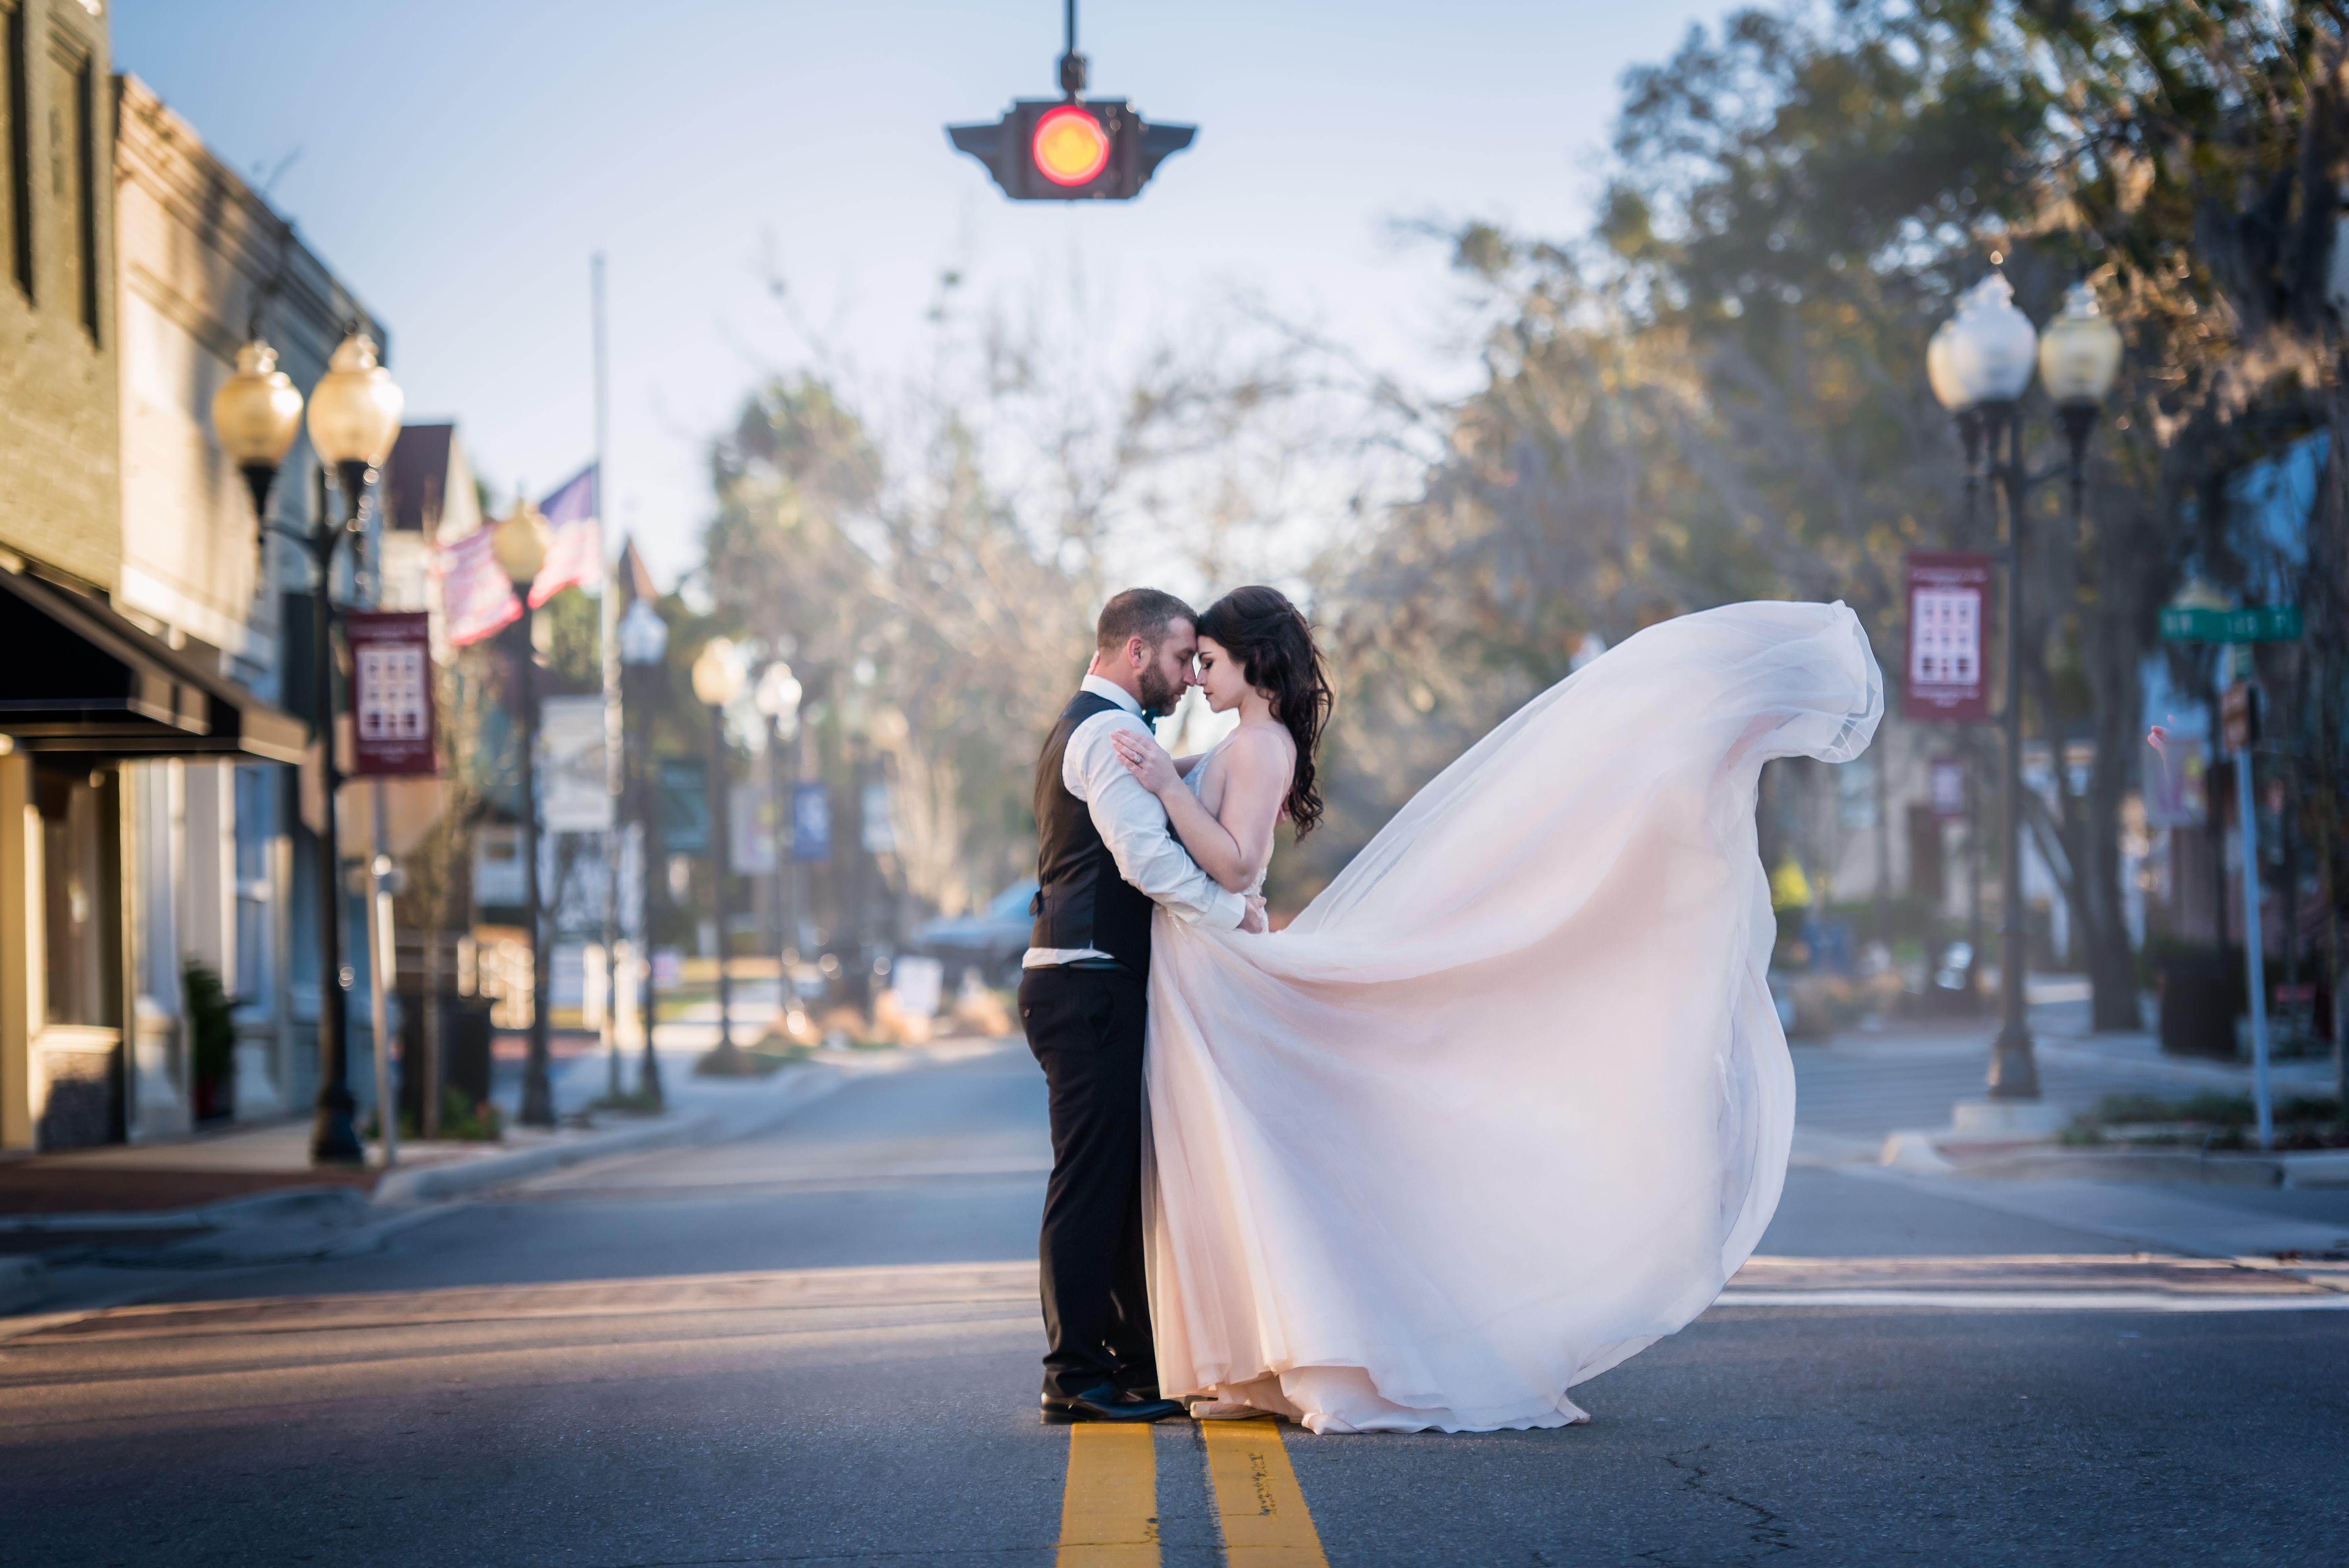 Wedding Dress Gown Toss Alachua Fl Wedding Ceremony Bride